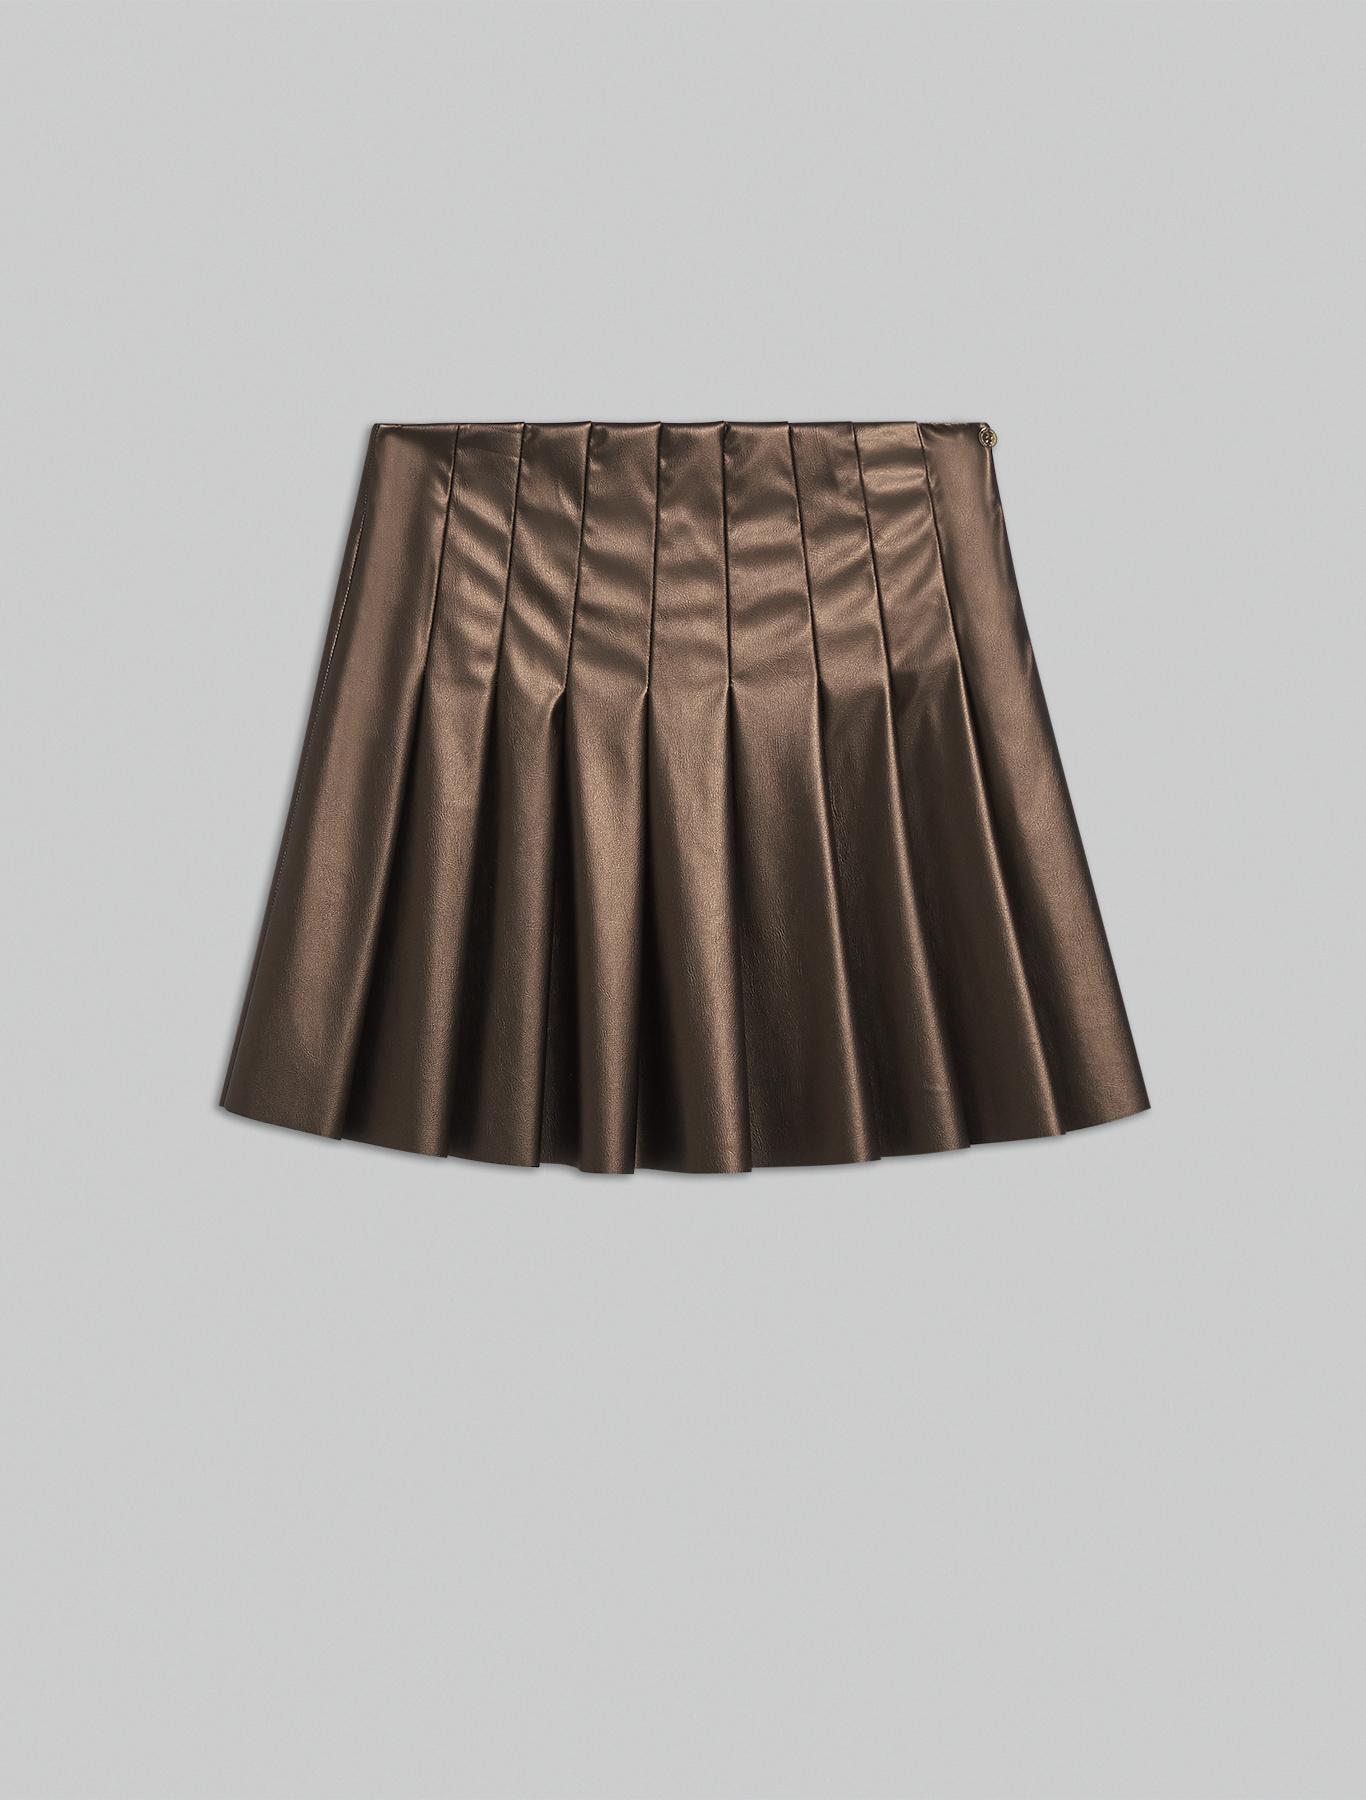 Metallic jersey skirt - bronze - pennyblack